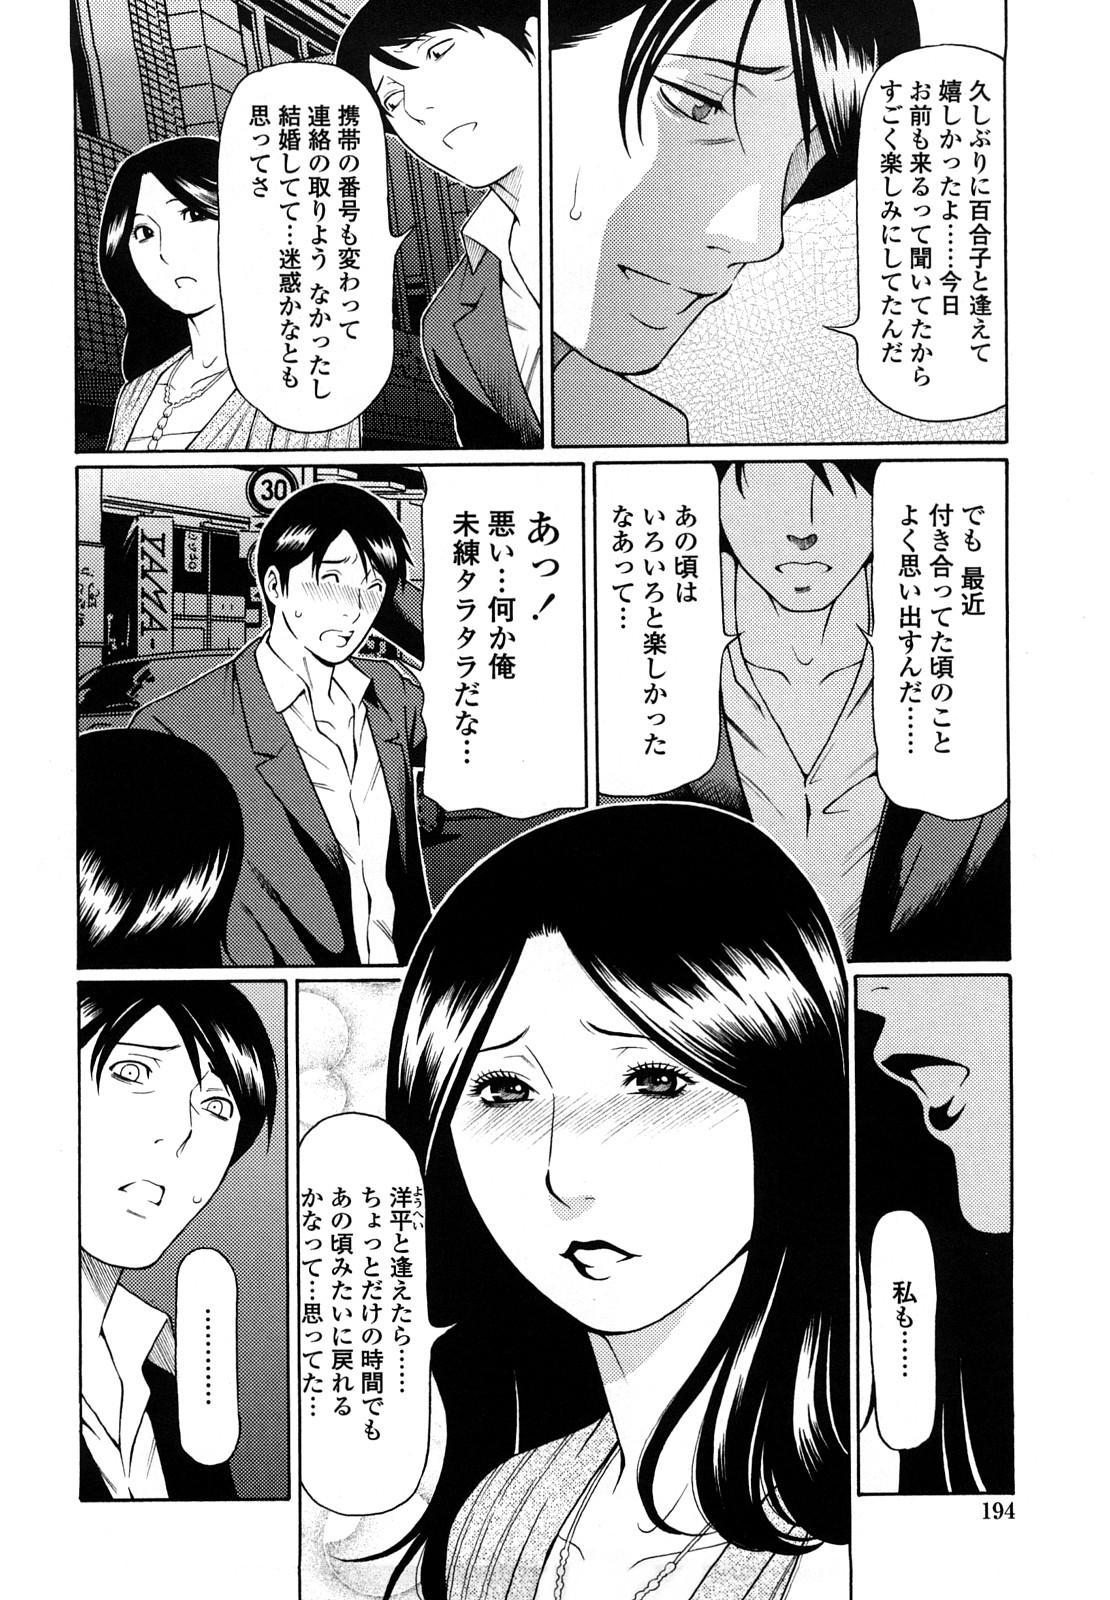 [Takasugi Kou] Kindan no Haha-Ana - Immorality Love-Hole [Decensored] 195